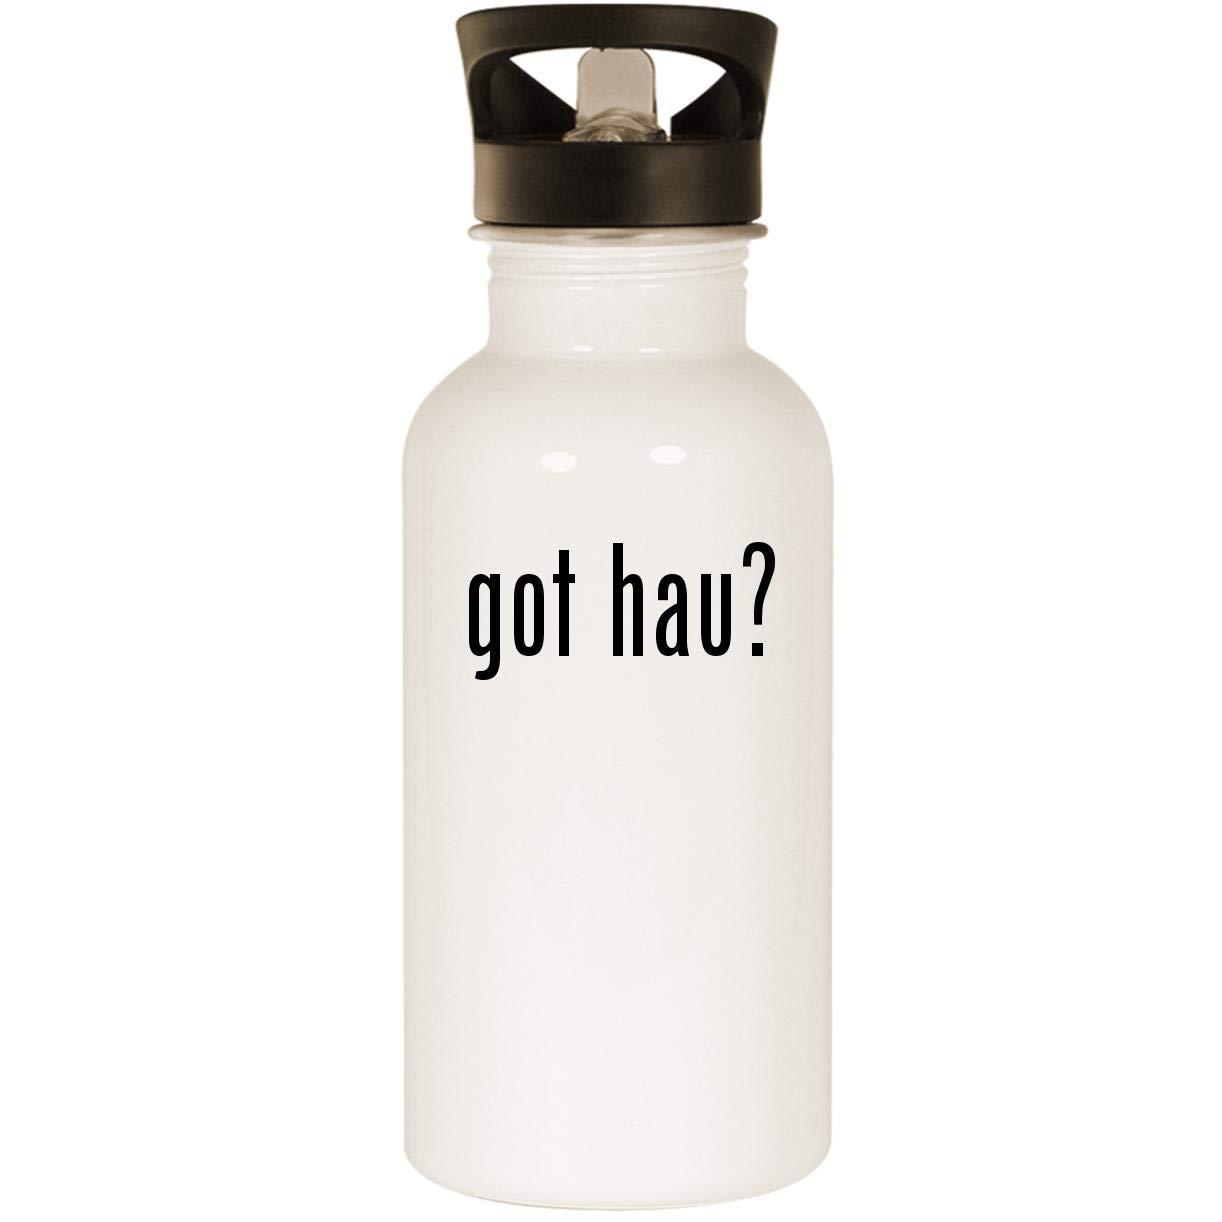 got hau? - Stainless Steel 20oz Road Ready Water Bottle, White